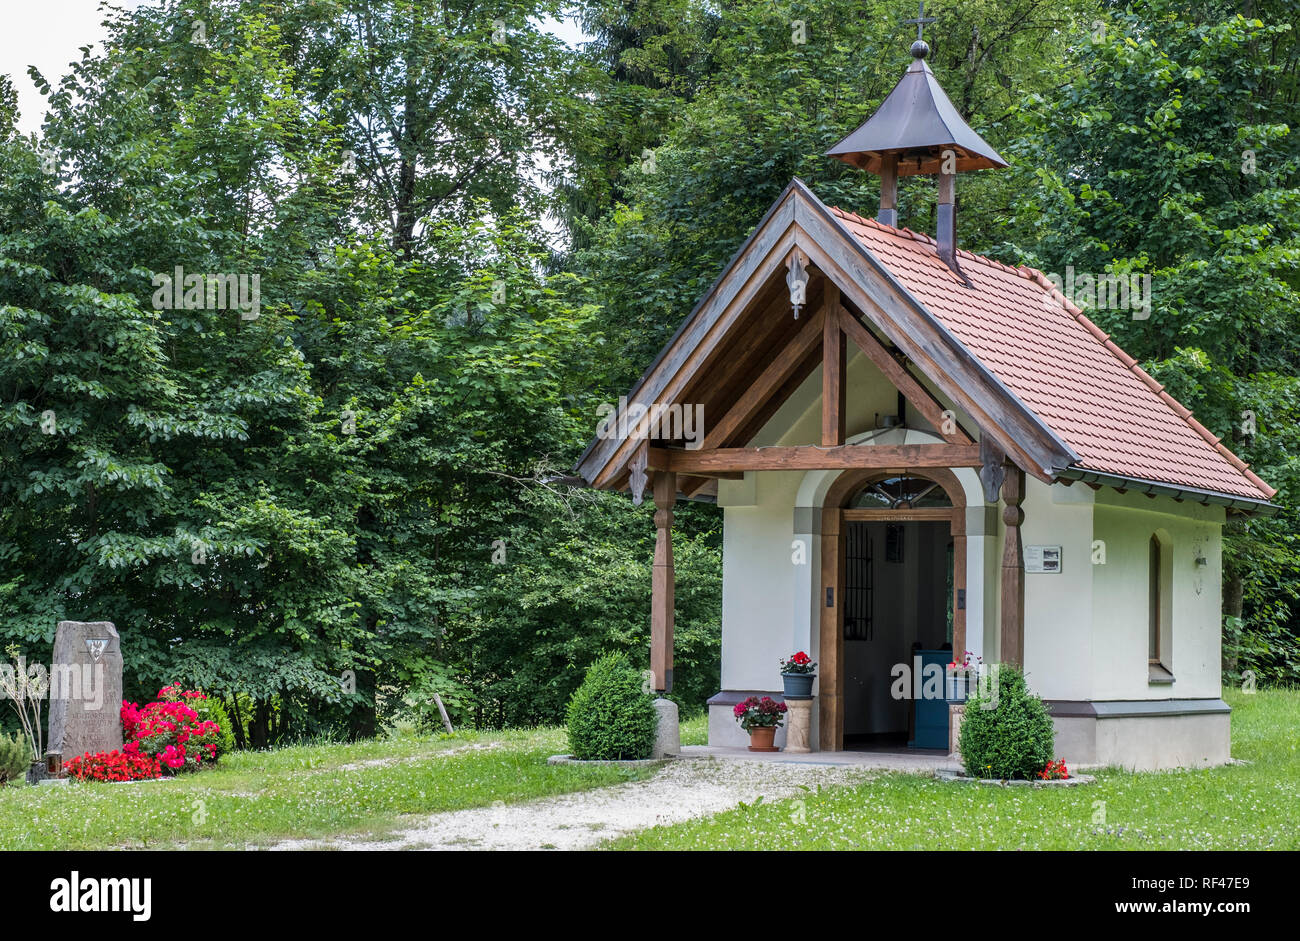 Bildstock oder Kapelle am Eisenartz, Oberbayern, Deutschland, Europa Stockbild